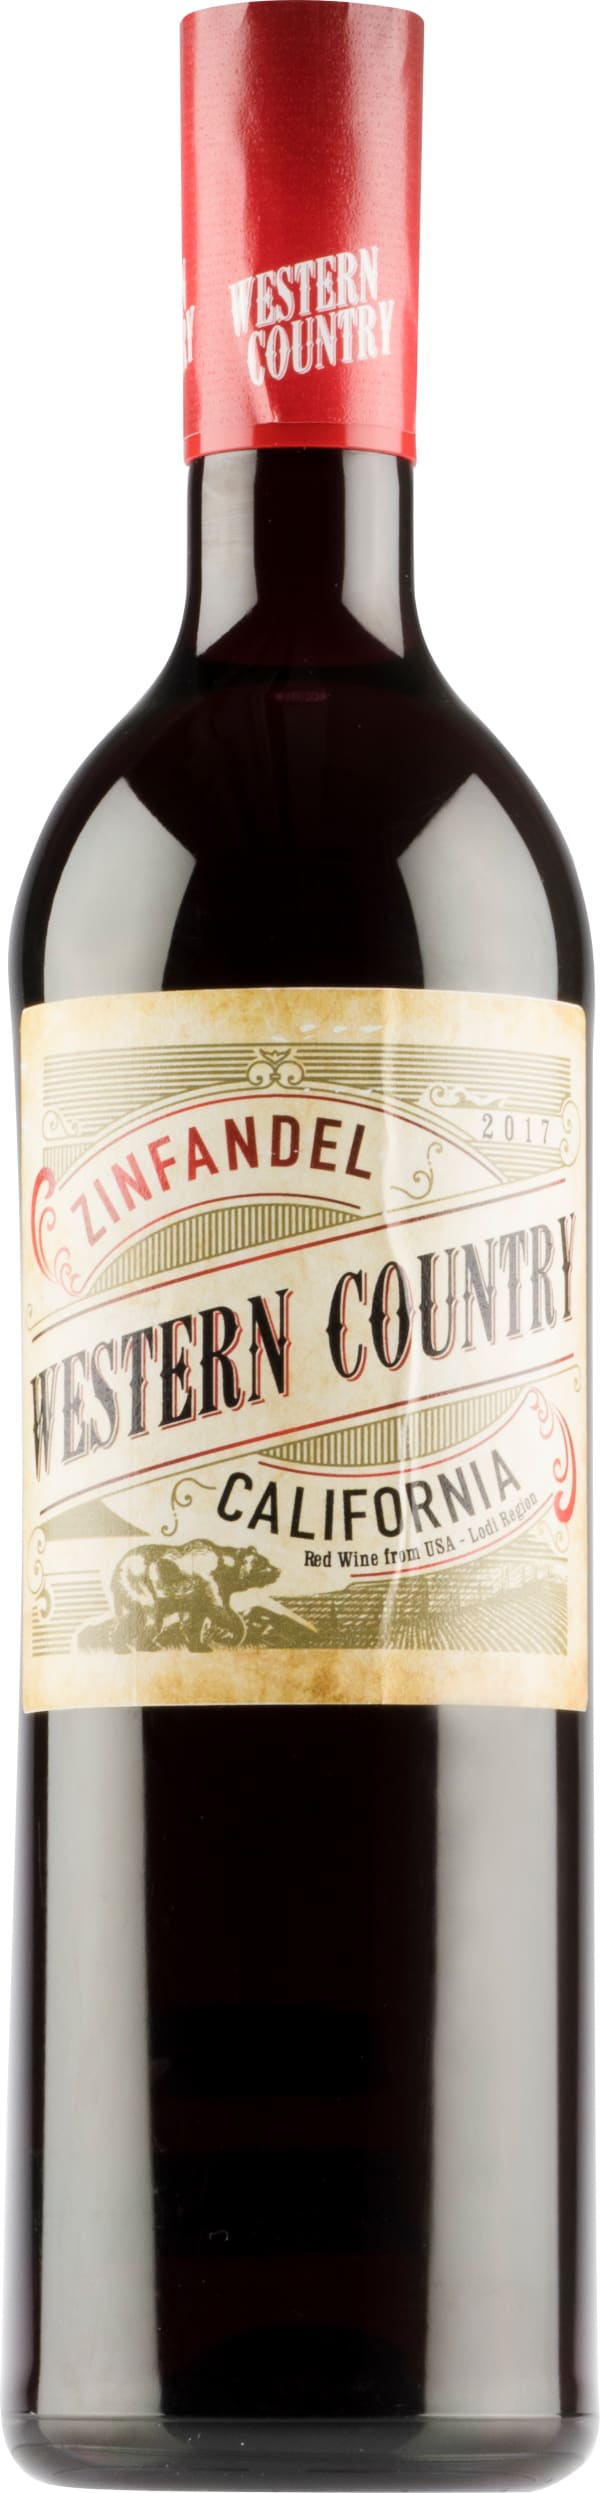 Western Country Zinfandel 2017 plastic bottle